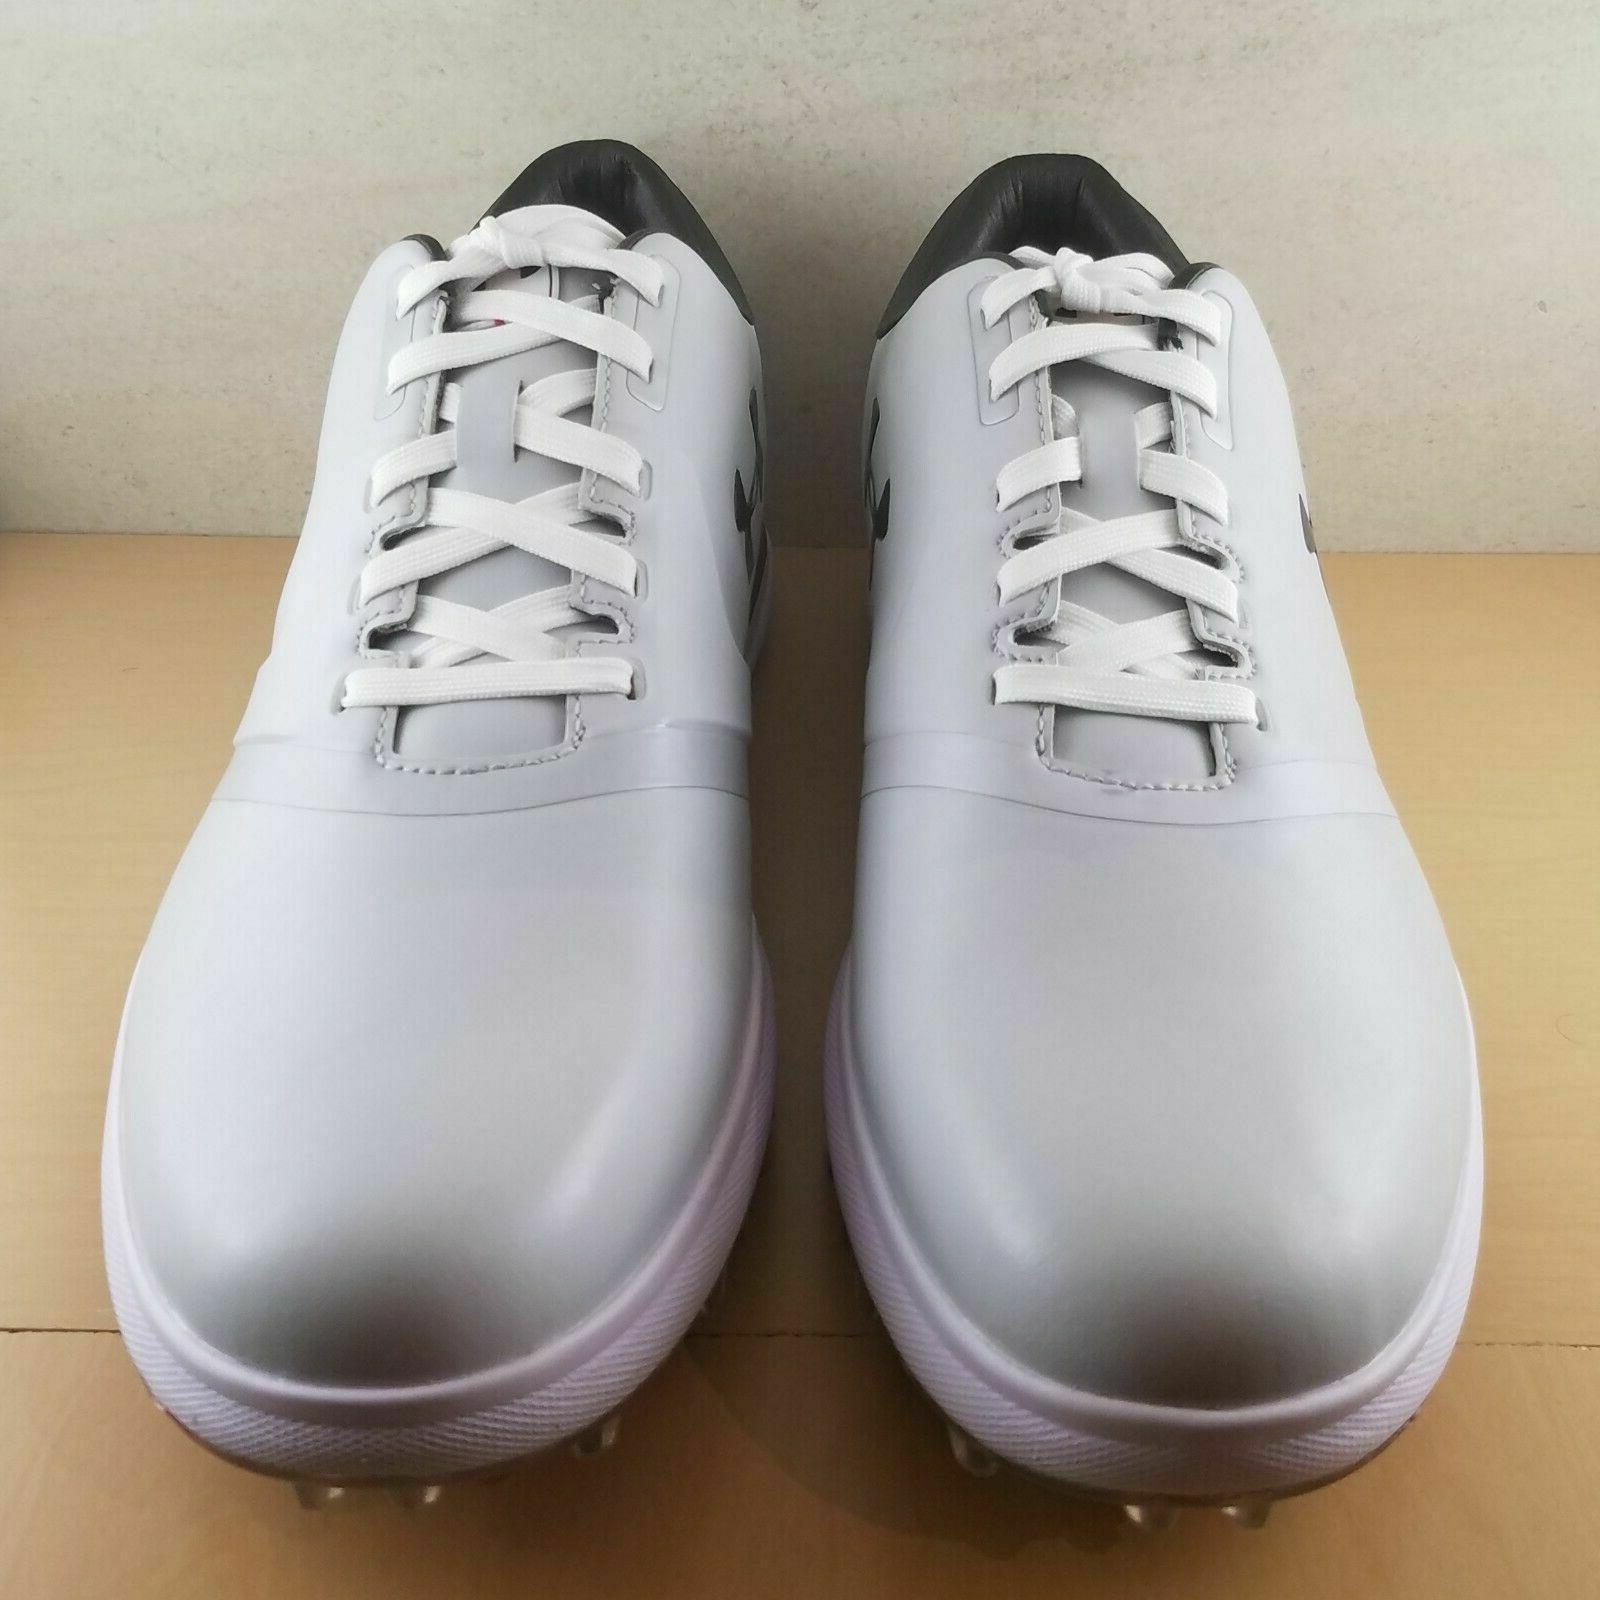 Under Armour SL Mens Golf Grey/White/Black